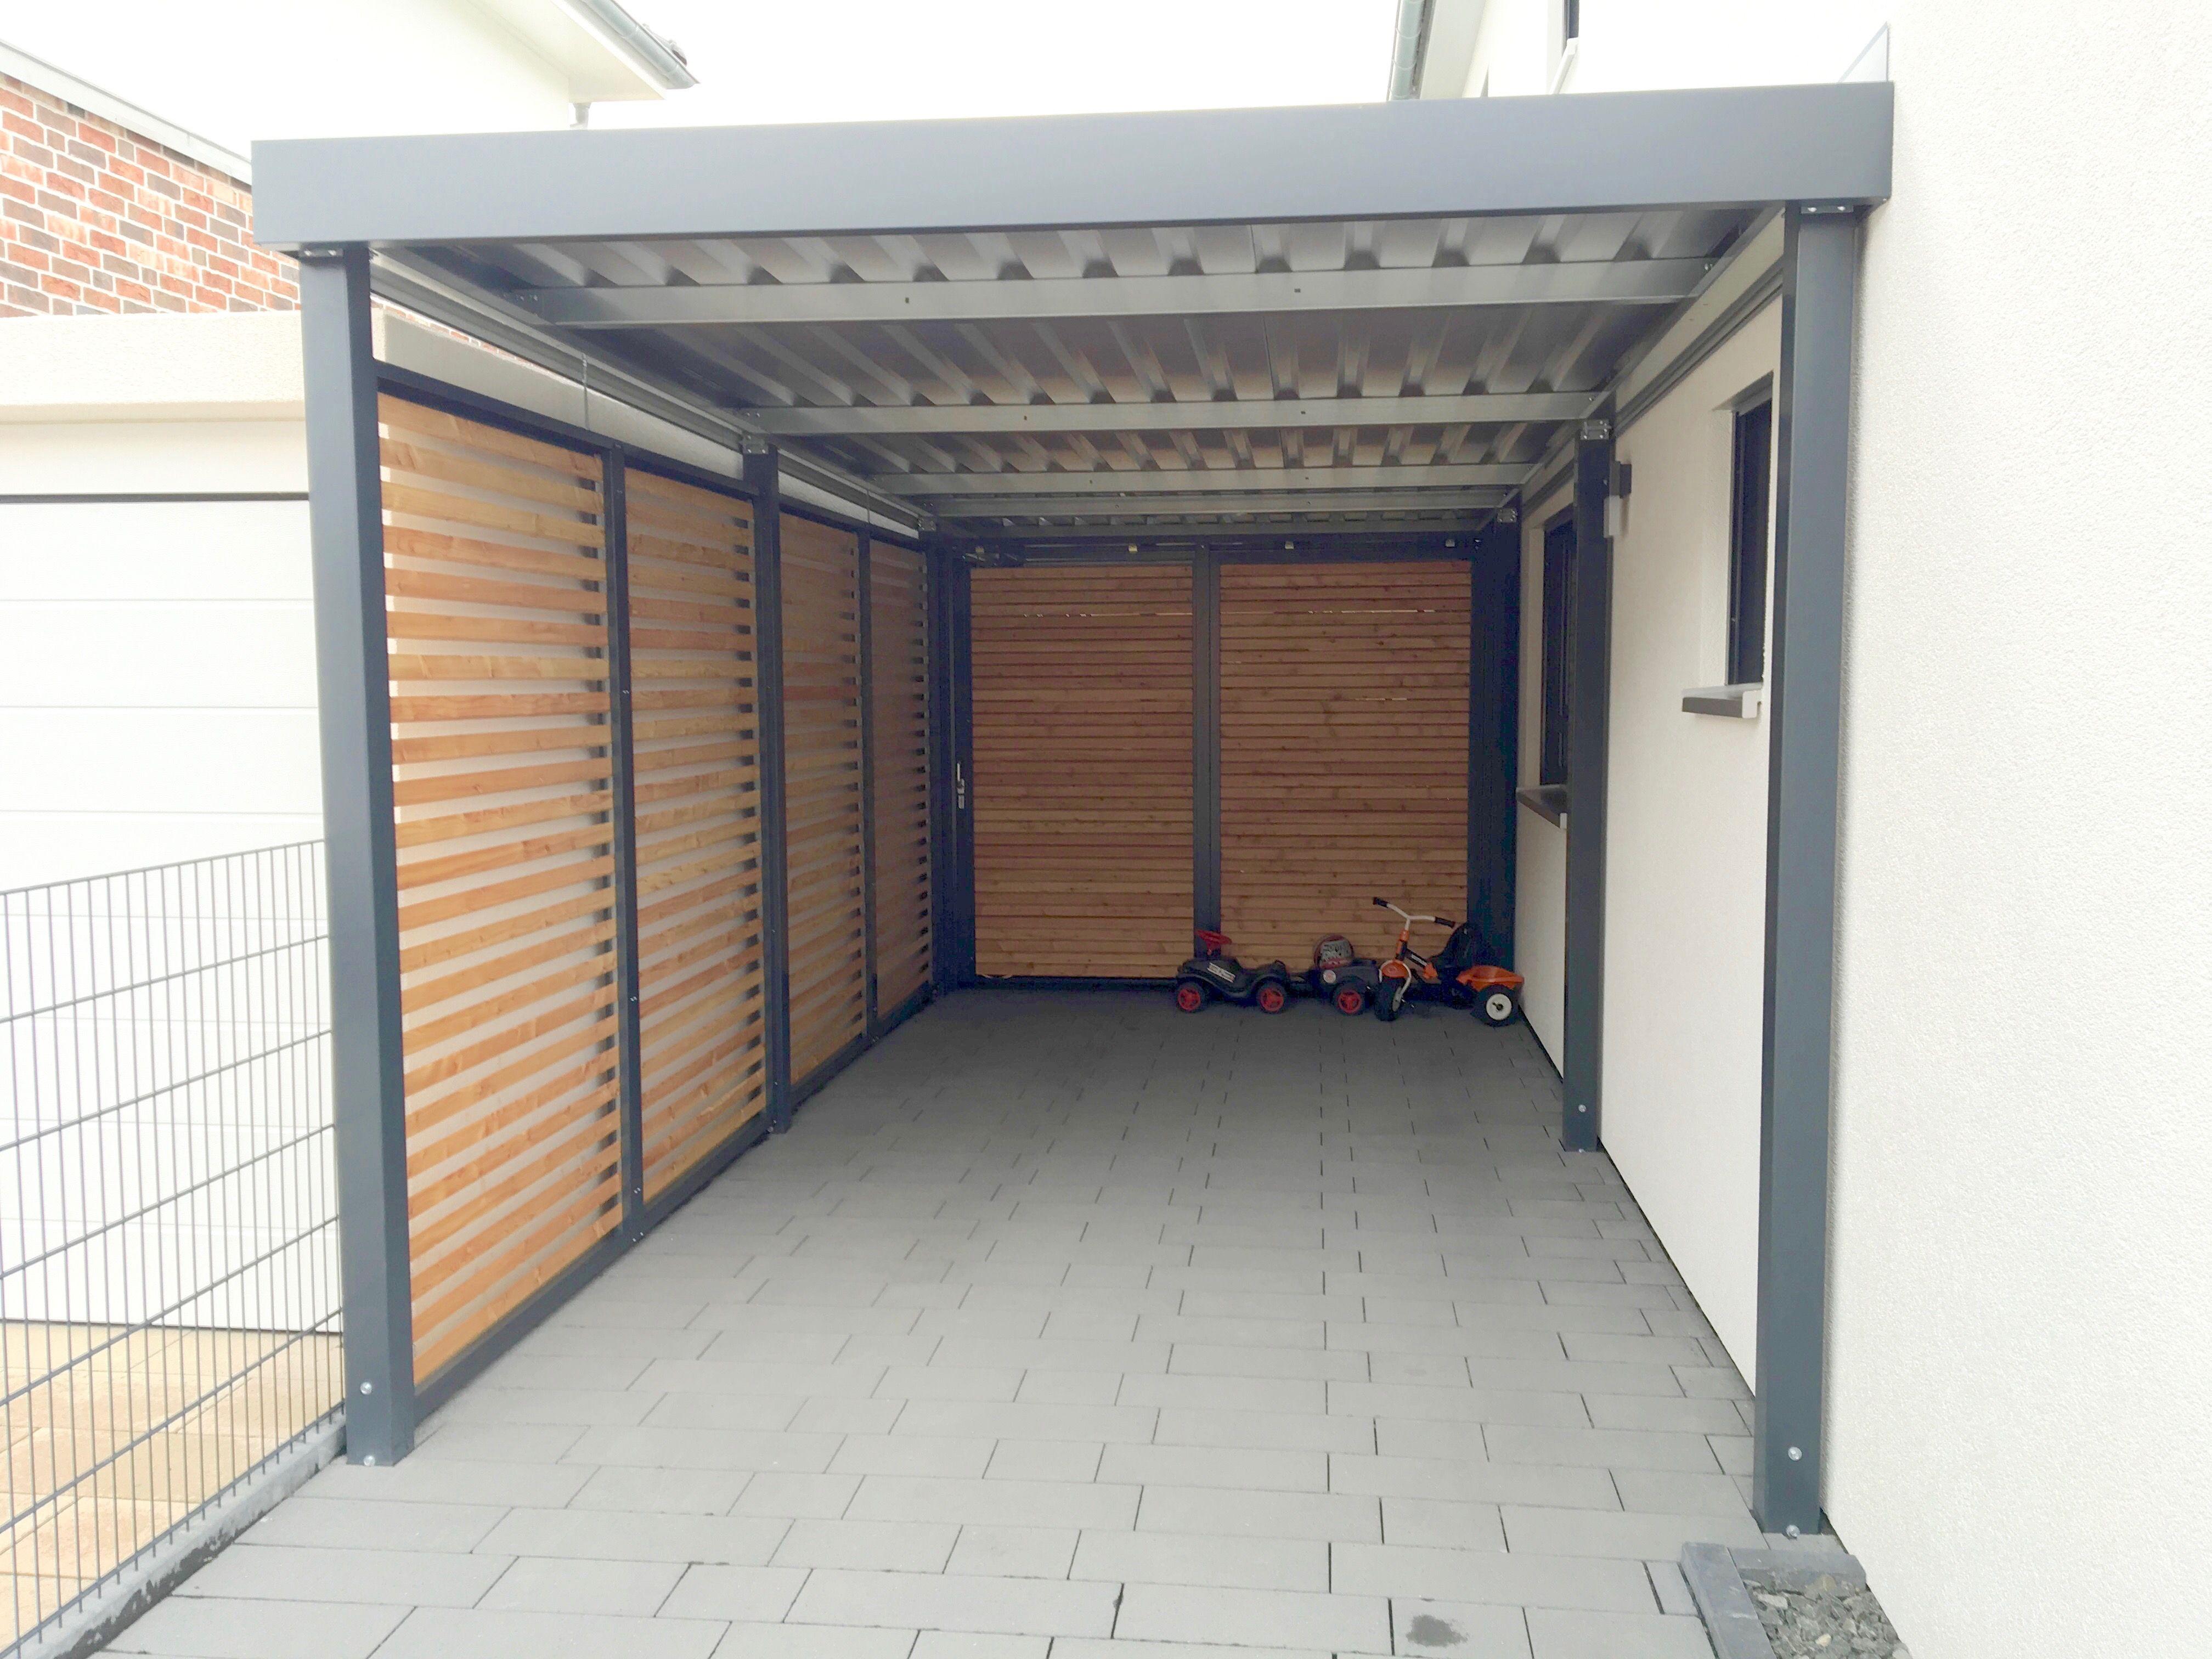 Carport Aus Metall In Ral 7016 Mit Gerateraum Hinten Aus Douglasie Rhombus Wandelementen Carport Holz Uberdachung Holz Carport Metall